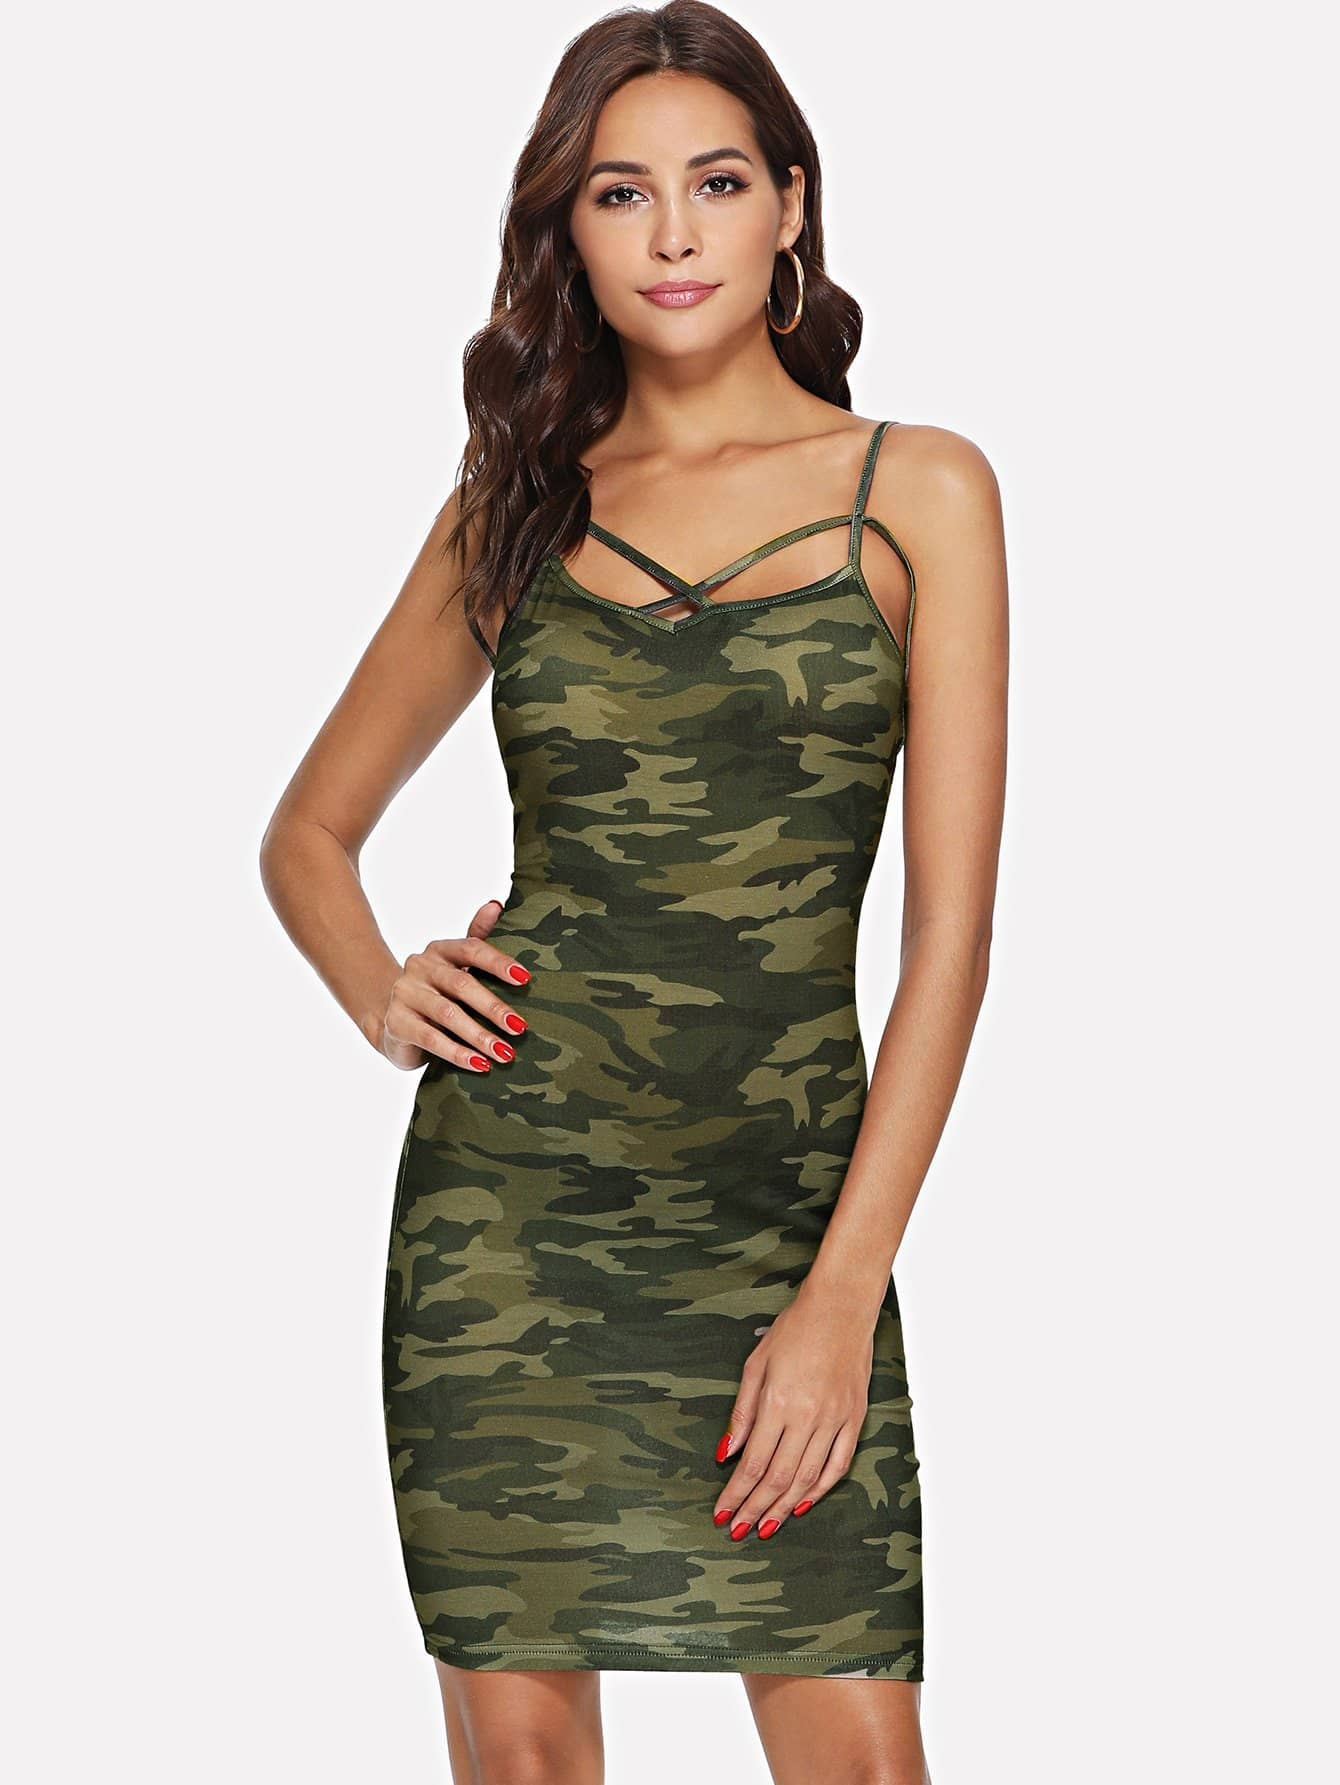 Crisscross Neck Form Fitting Camo Print Dress camo print night dress